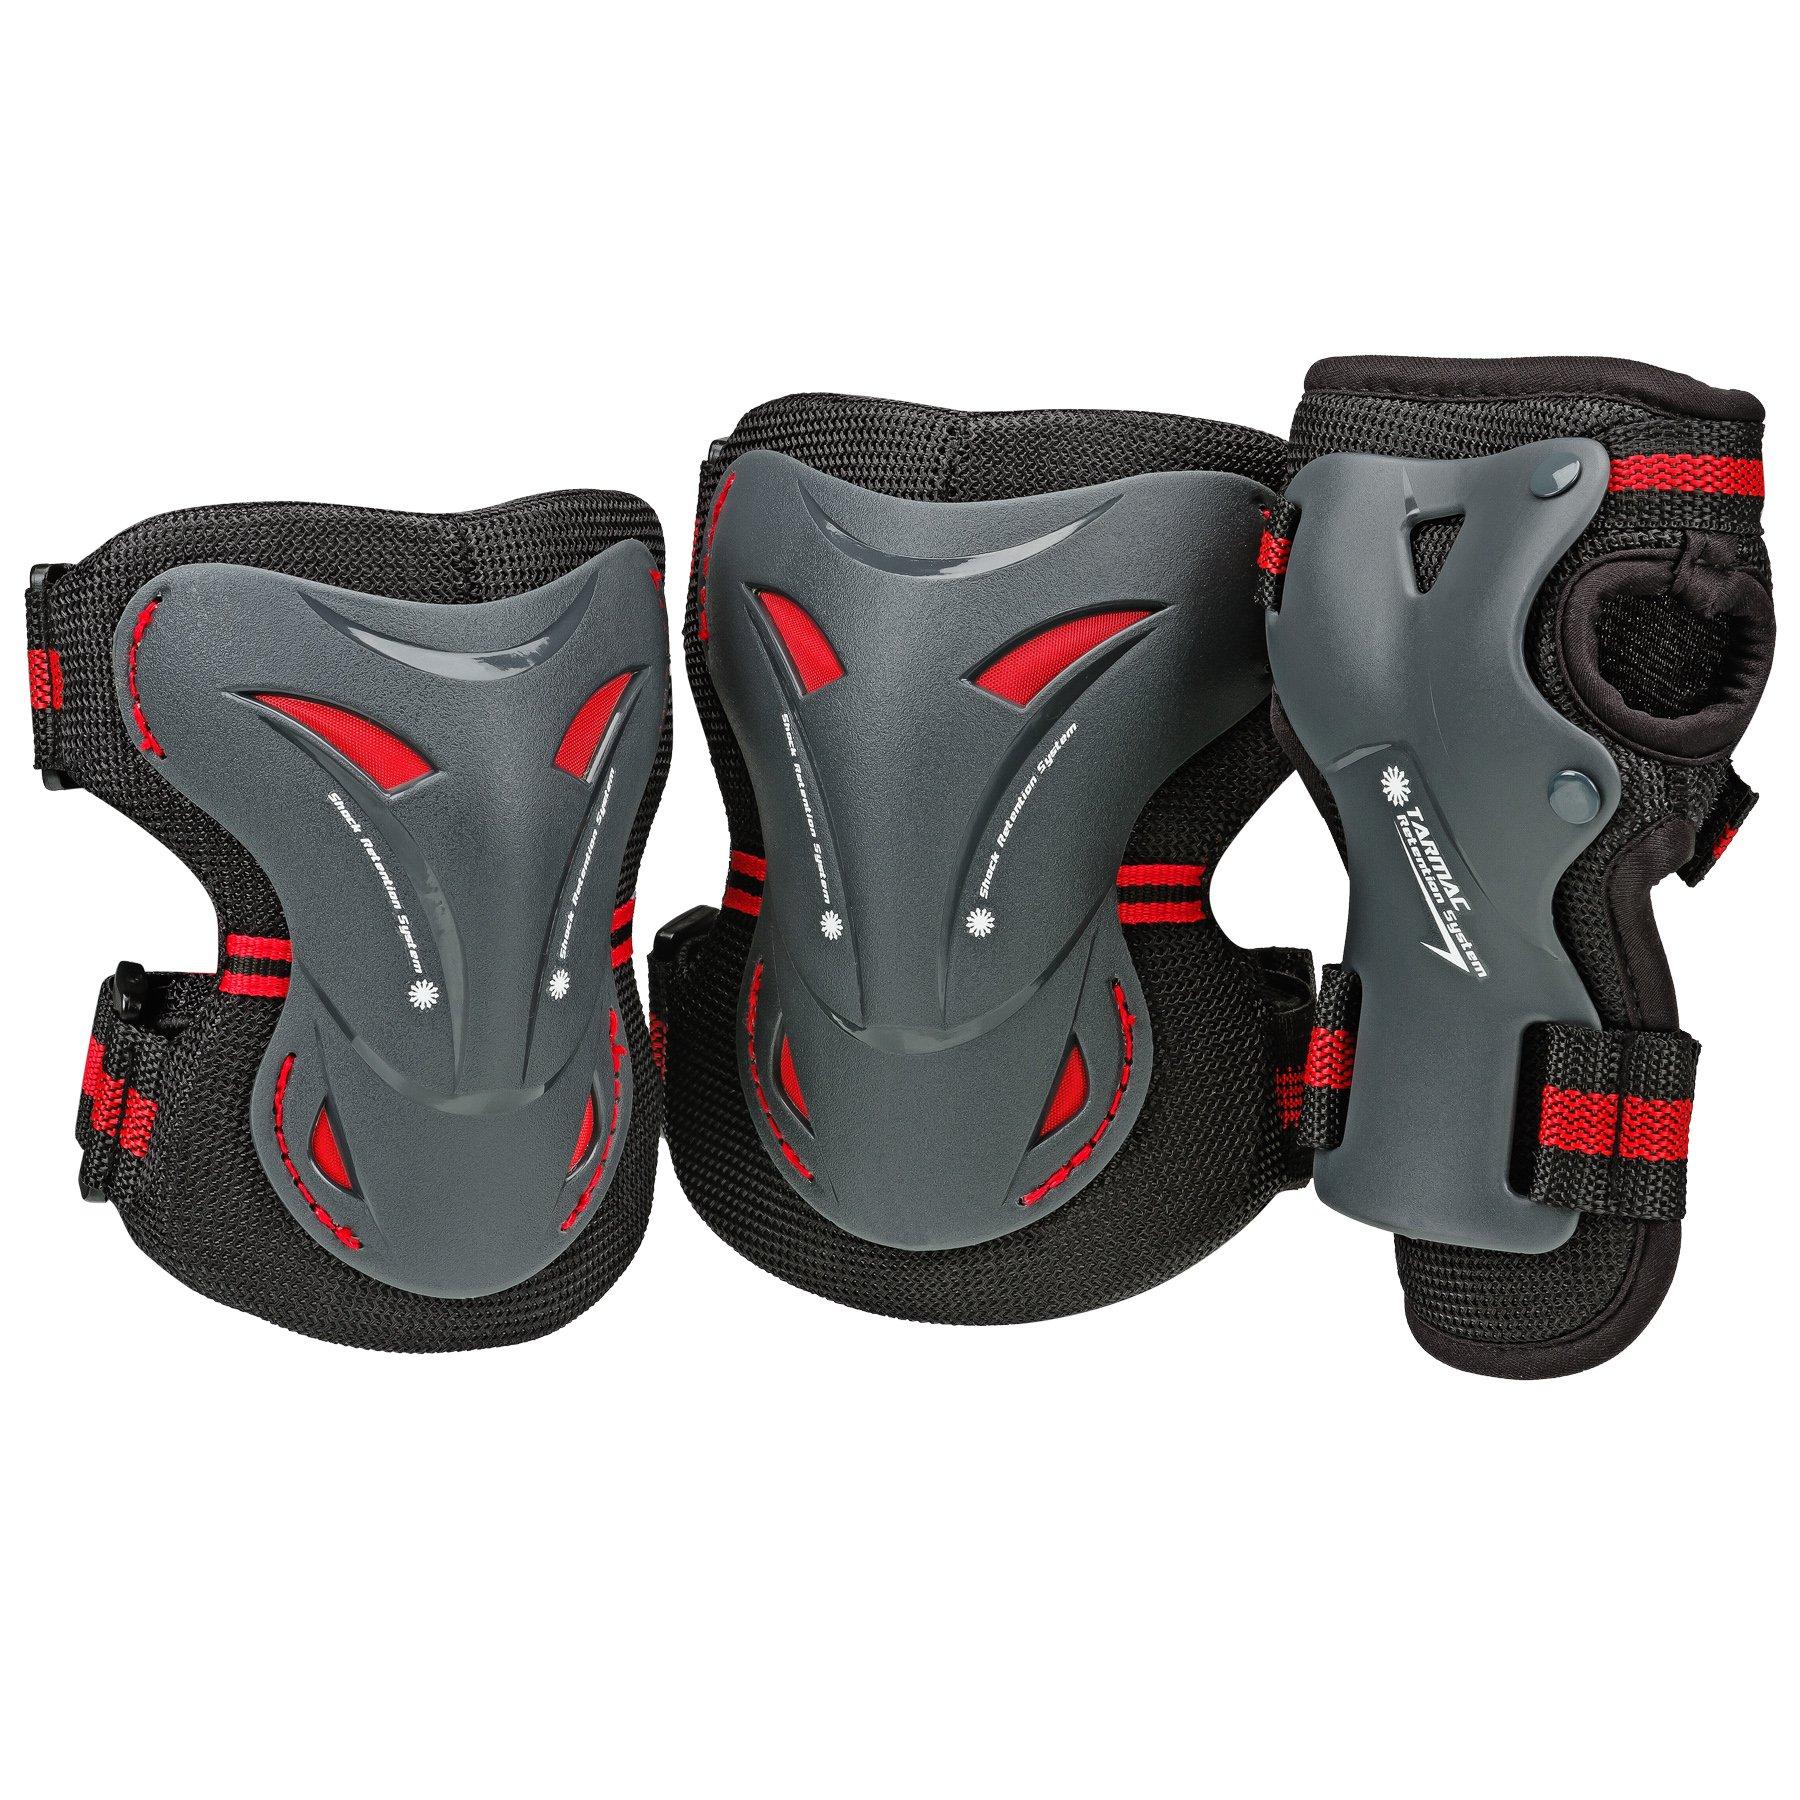 BoneShieldz Tarmac 360 Tri Pack Protective